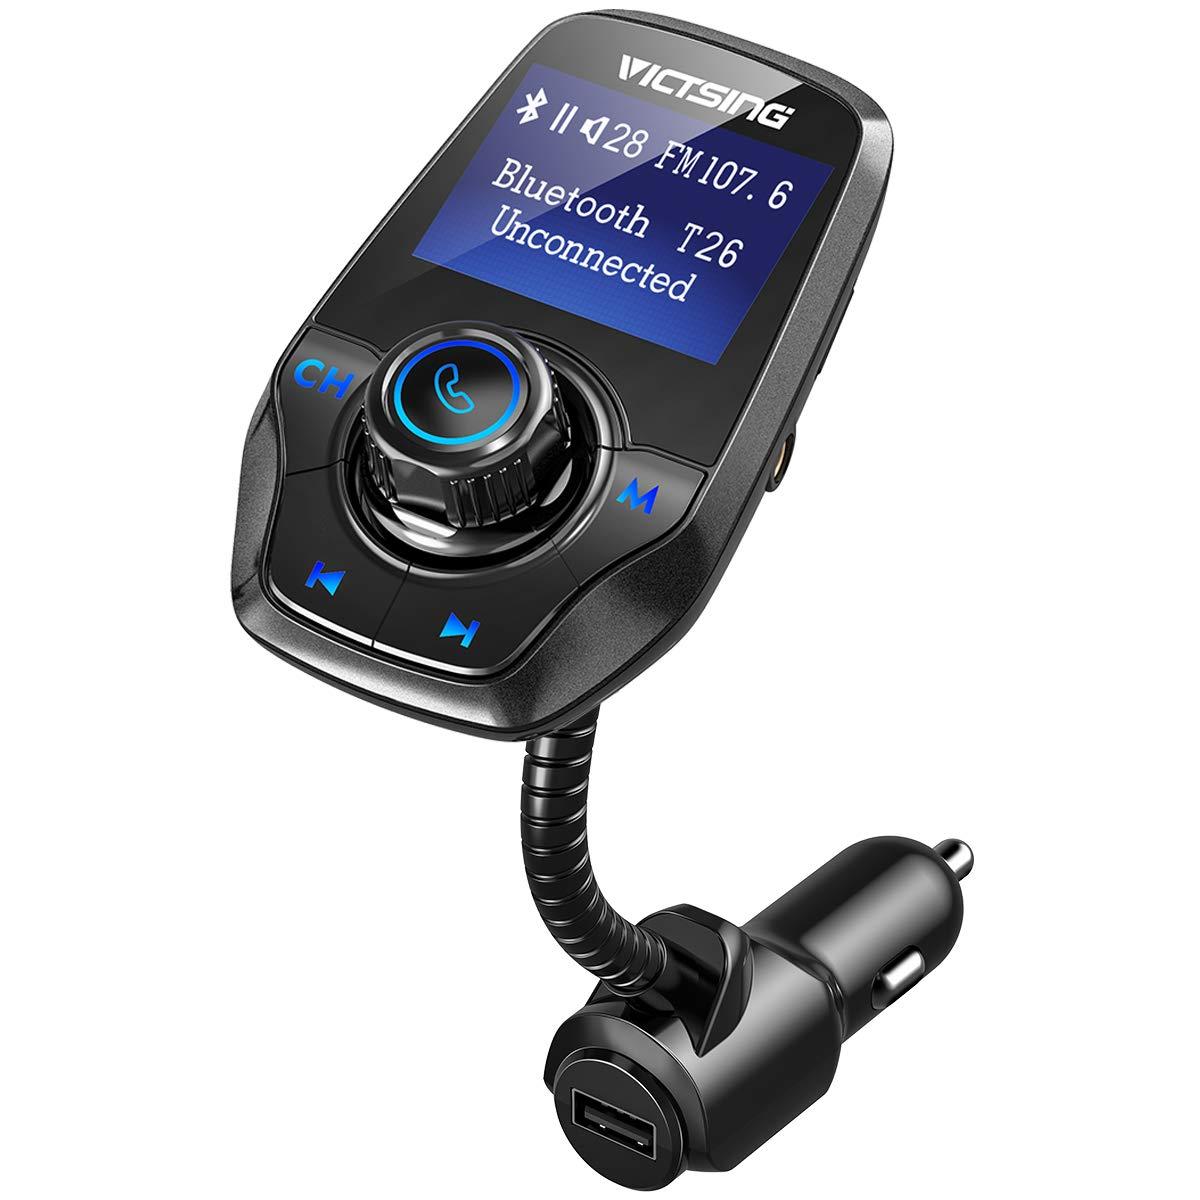 Radio Musica Receptor Altavoz Bluetooth FM Tarjeta del TF-Gris 1.44 LCD VICTSING Manos Libres Bluetooth Coche Transmisor FM 5V//2.1A USB Reproductor de MP3 Transmitter